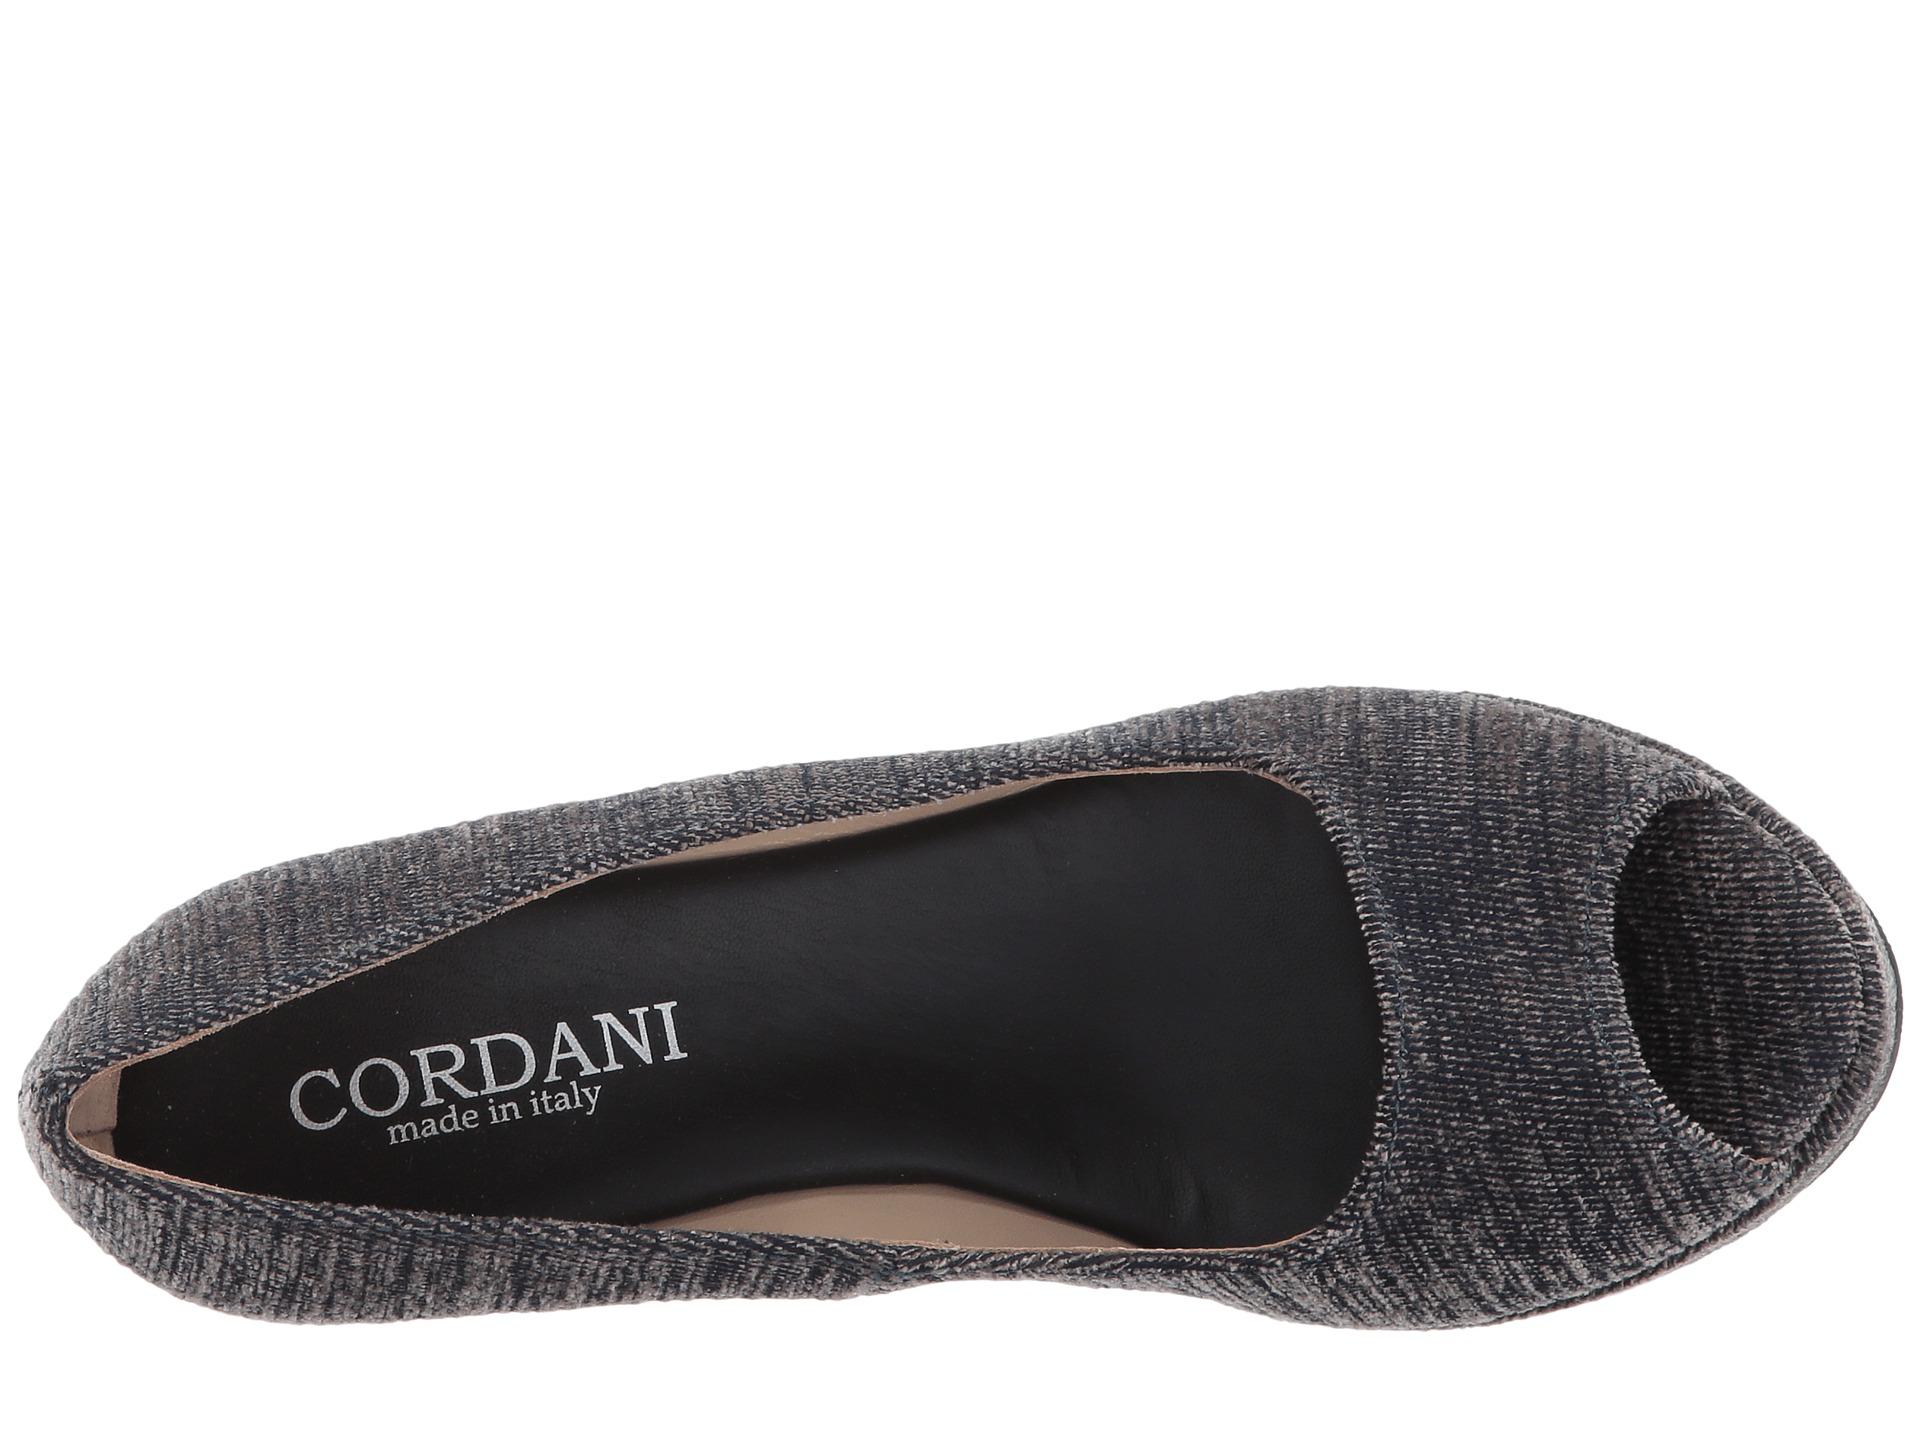 Cordani Shoes Size Chart